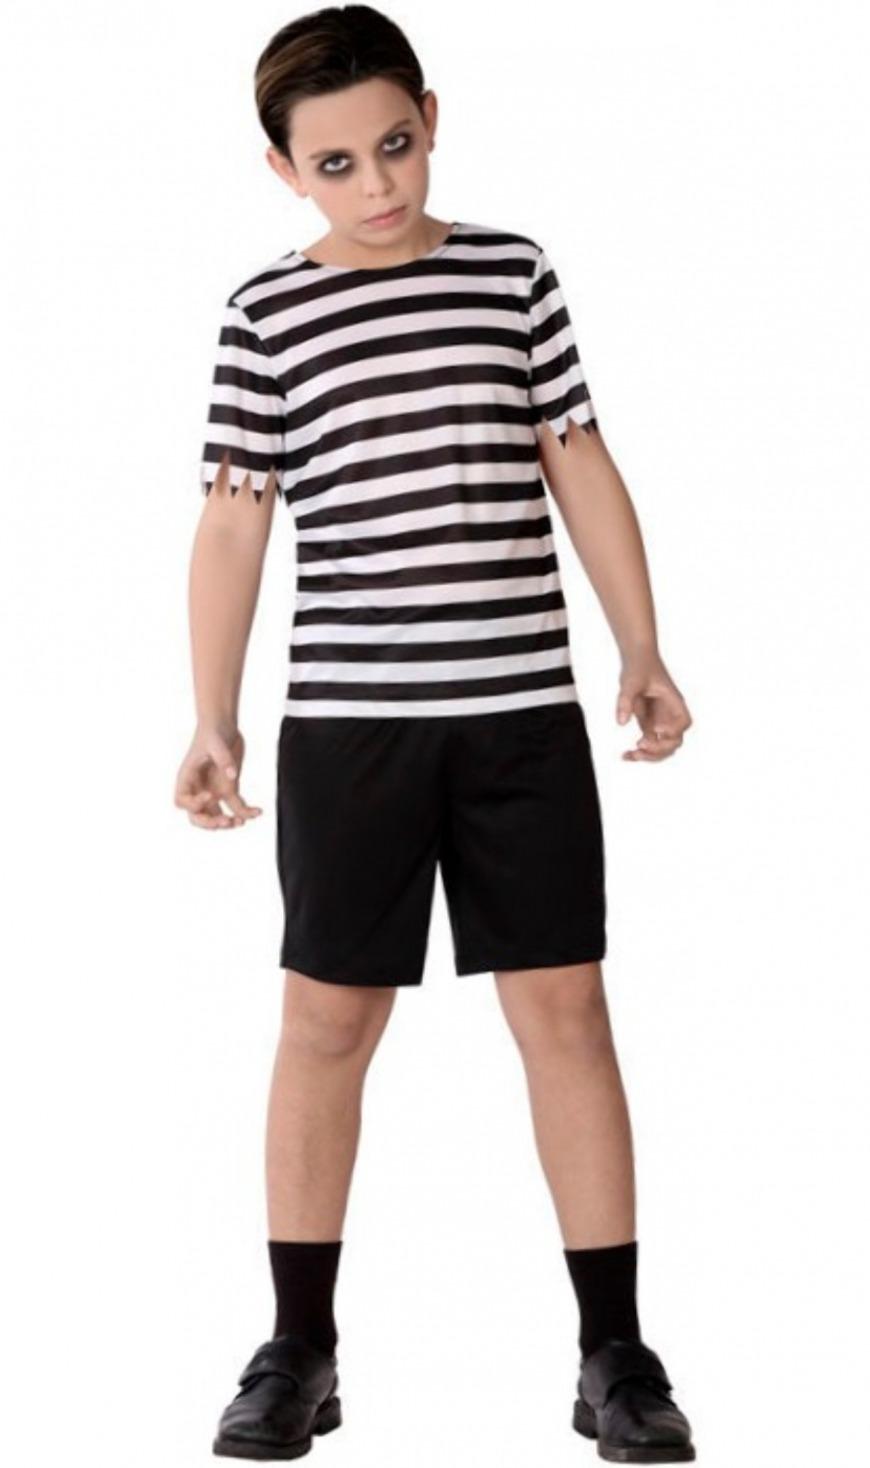 Pugsley Addams children's costume